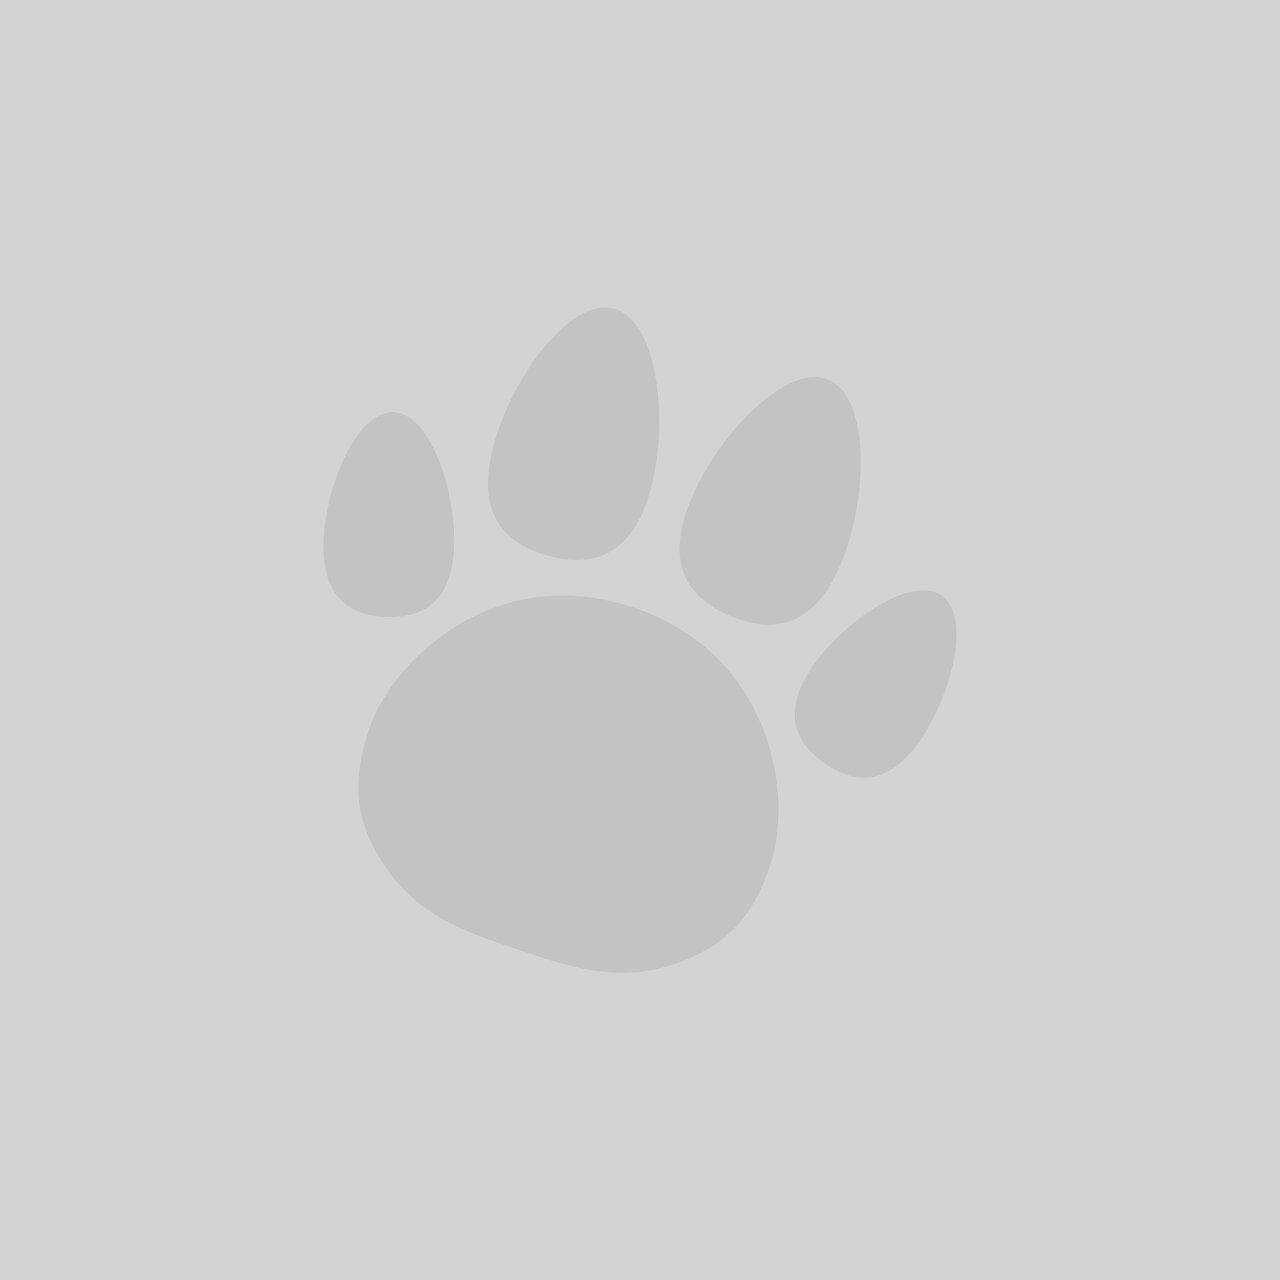 Iams Small and Medium Breed Puppy Food 12kg